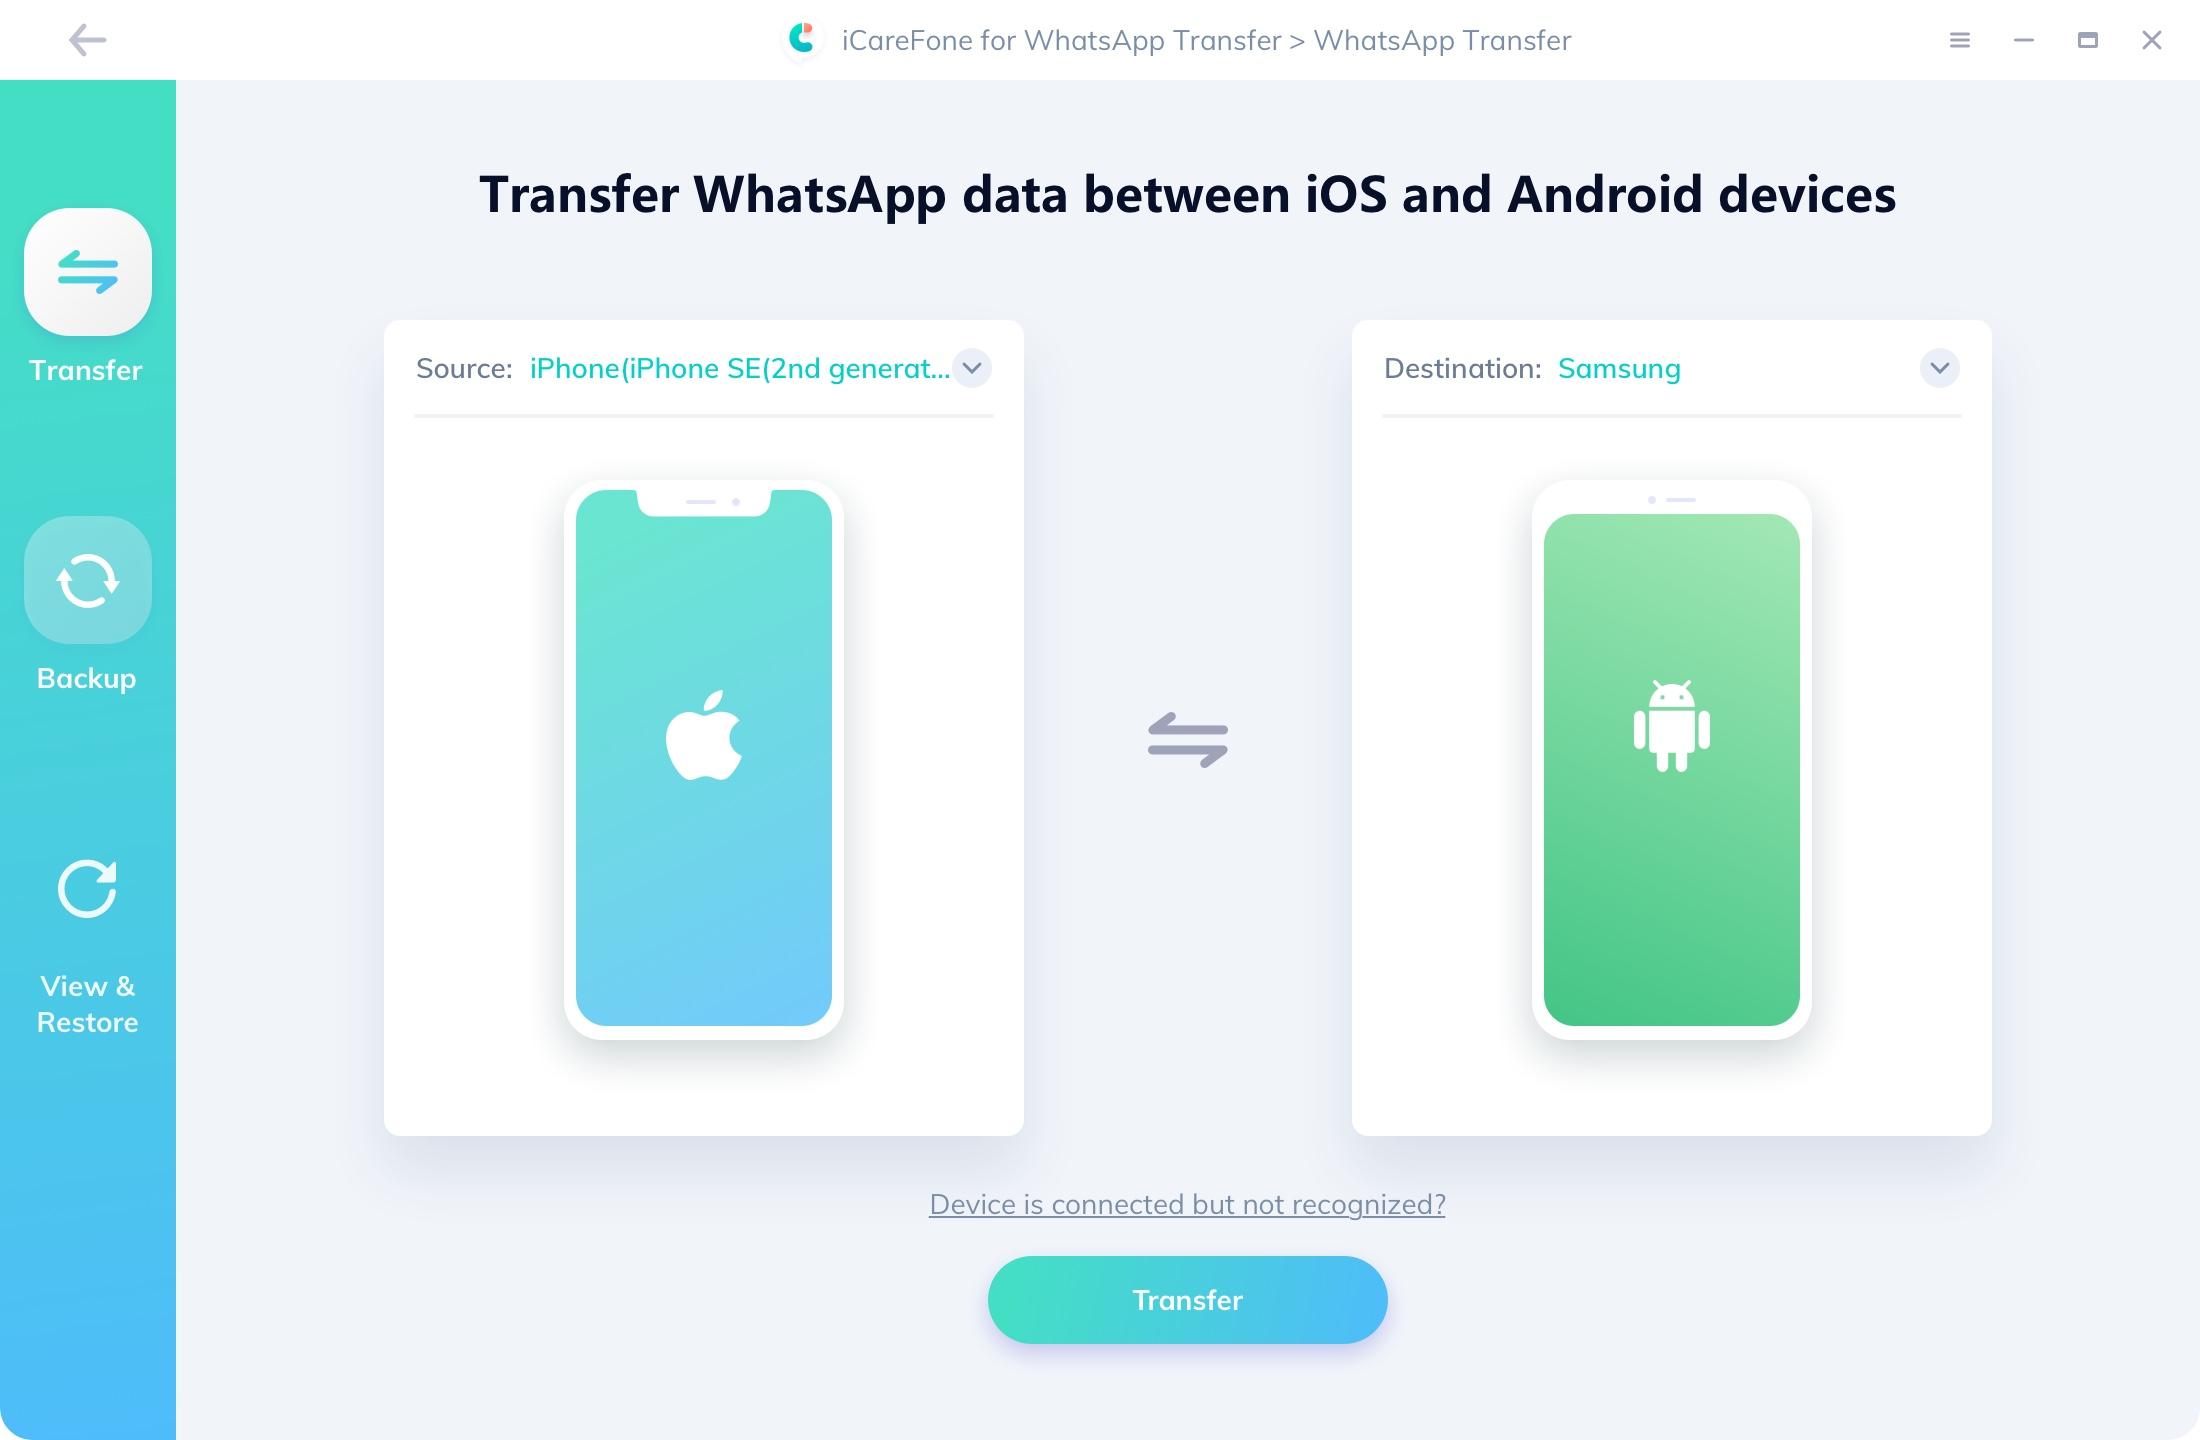 iCareFone whatsapp transférer - guide